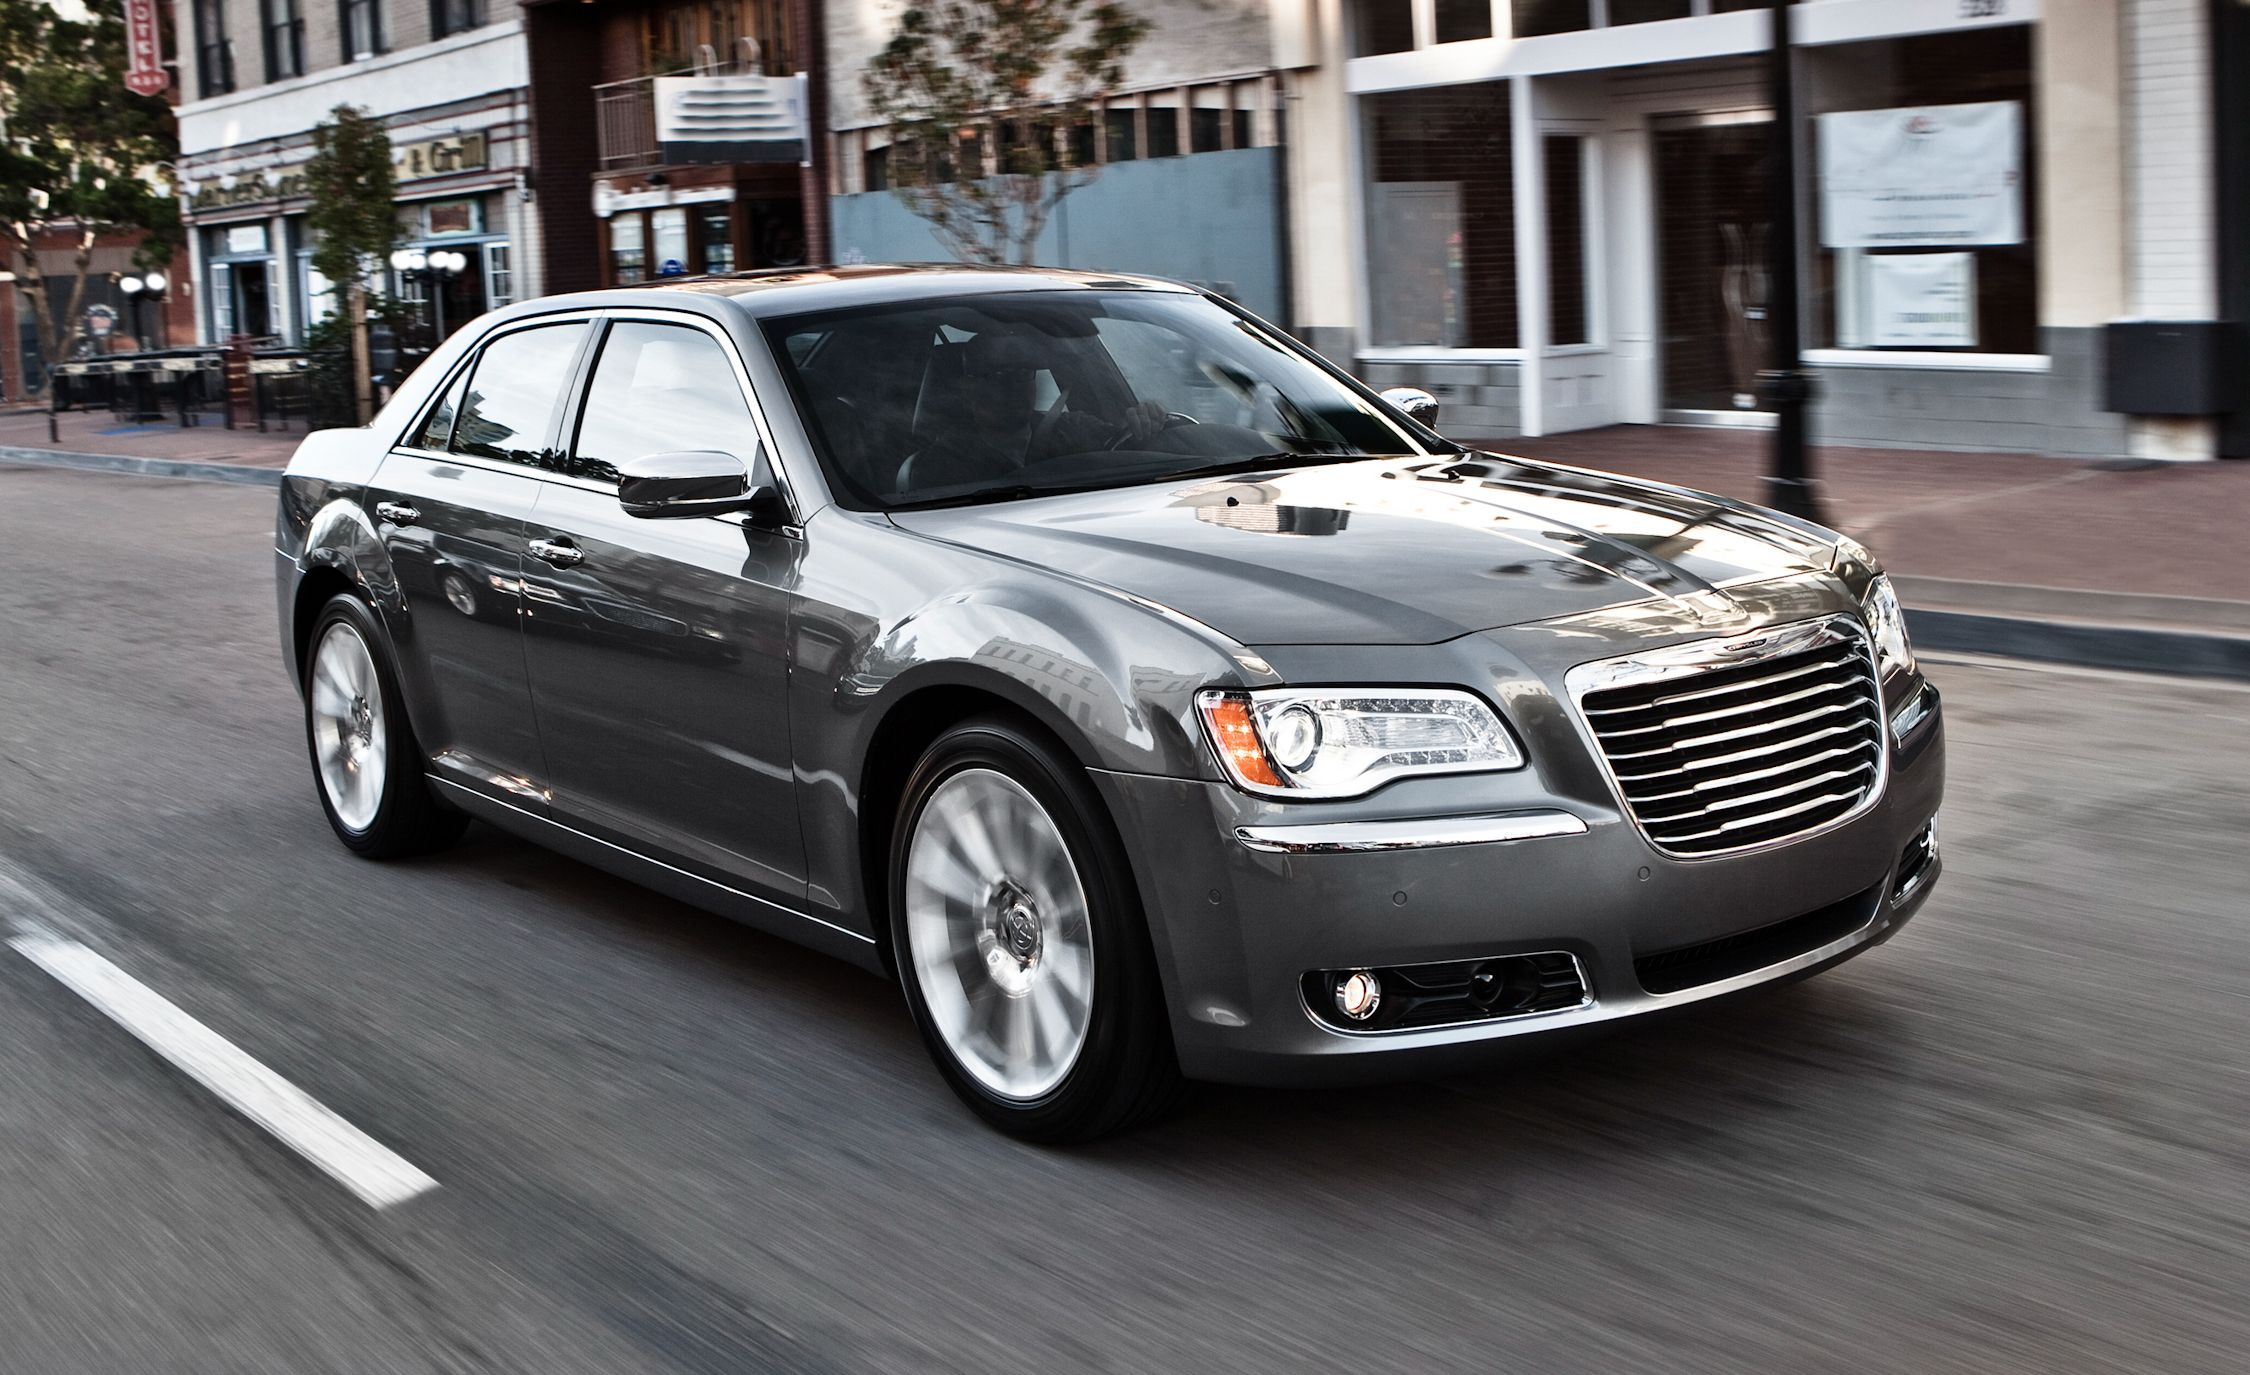 2011 chrysler 300 300c review car and driver rh caranddriver com Chrysler 300 Manual Online 2012 chrysler 300 service manual pdf download